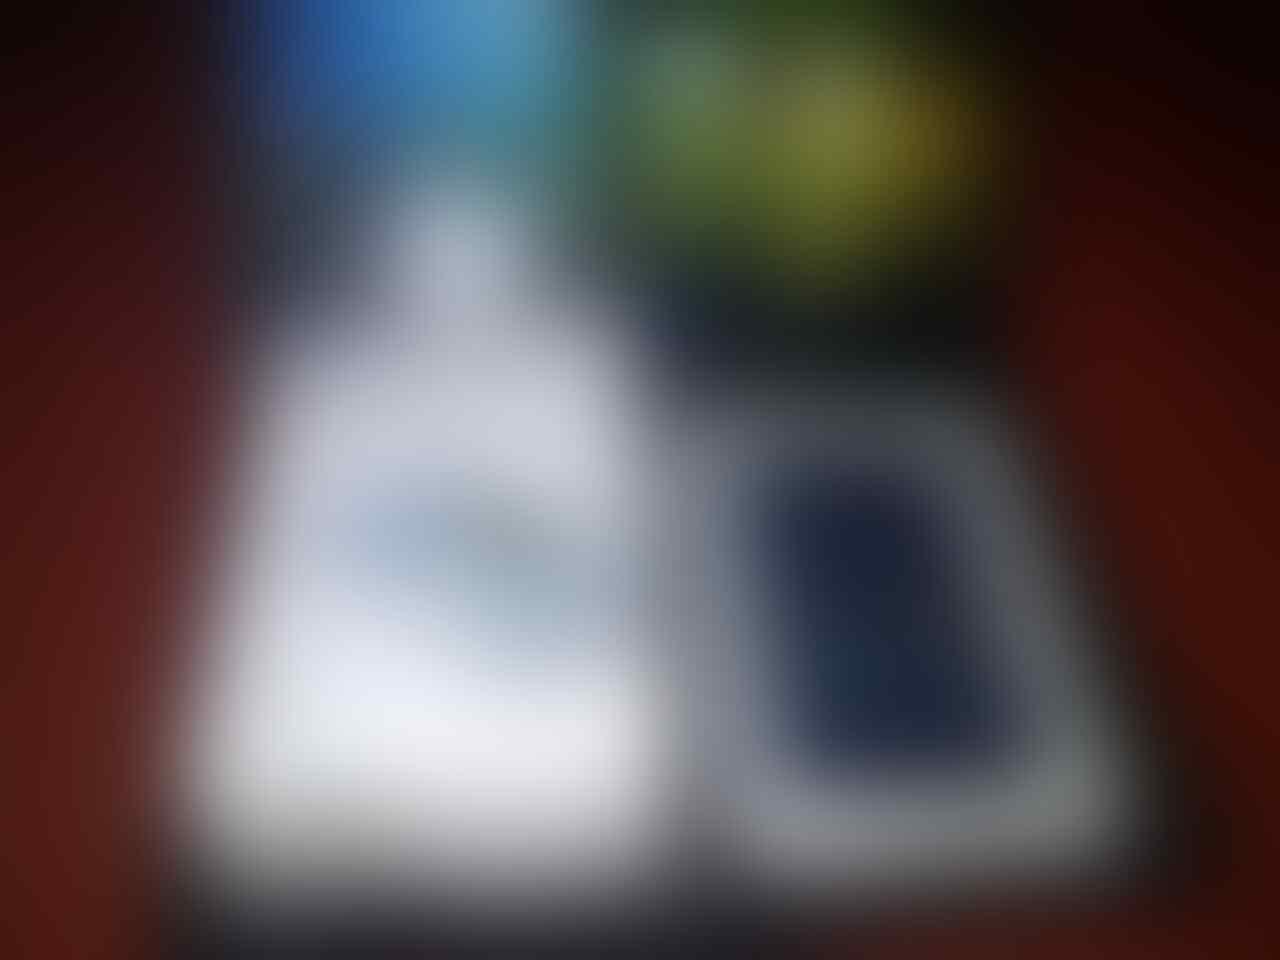 Samsung Galaxy Tab 2 7Inci P3100 White 98% Like New dan Banyak Bonus Area Malang